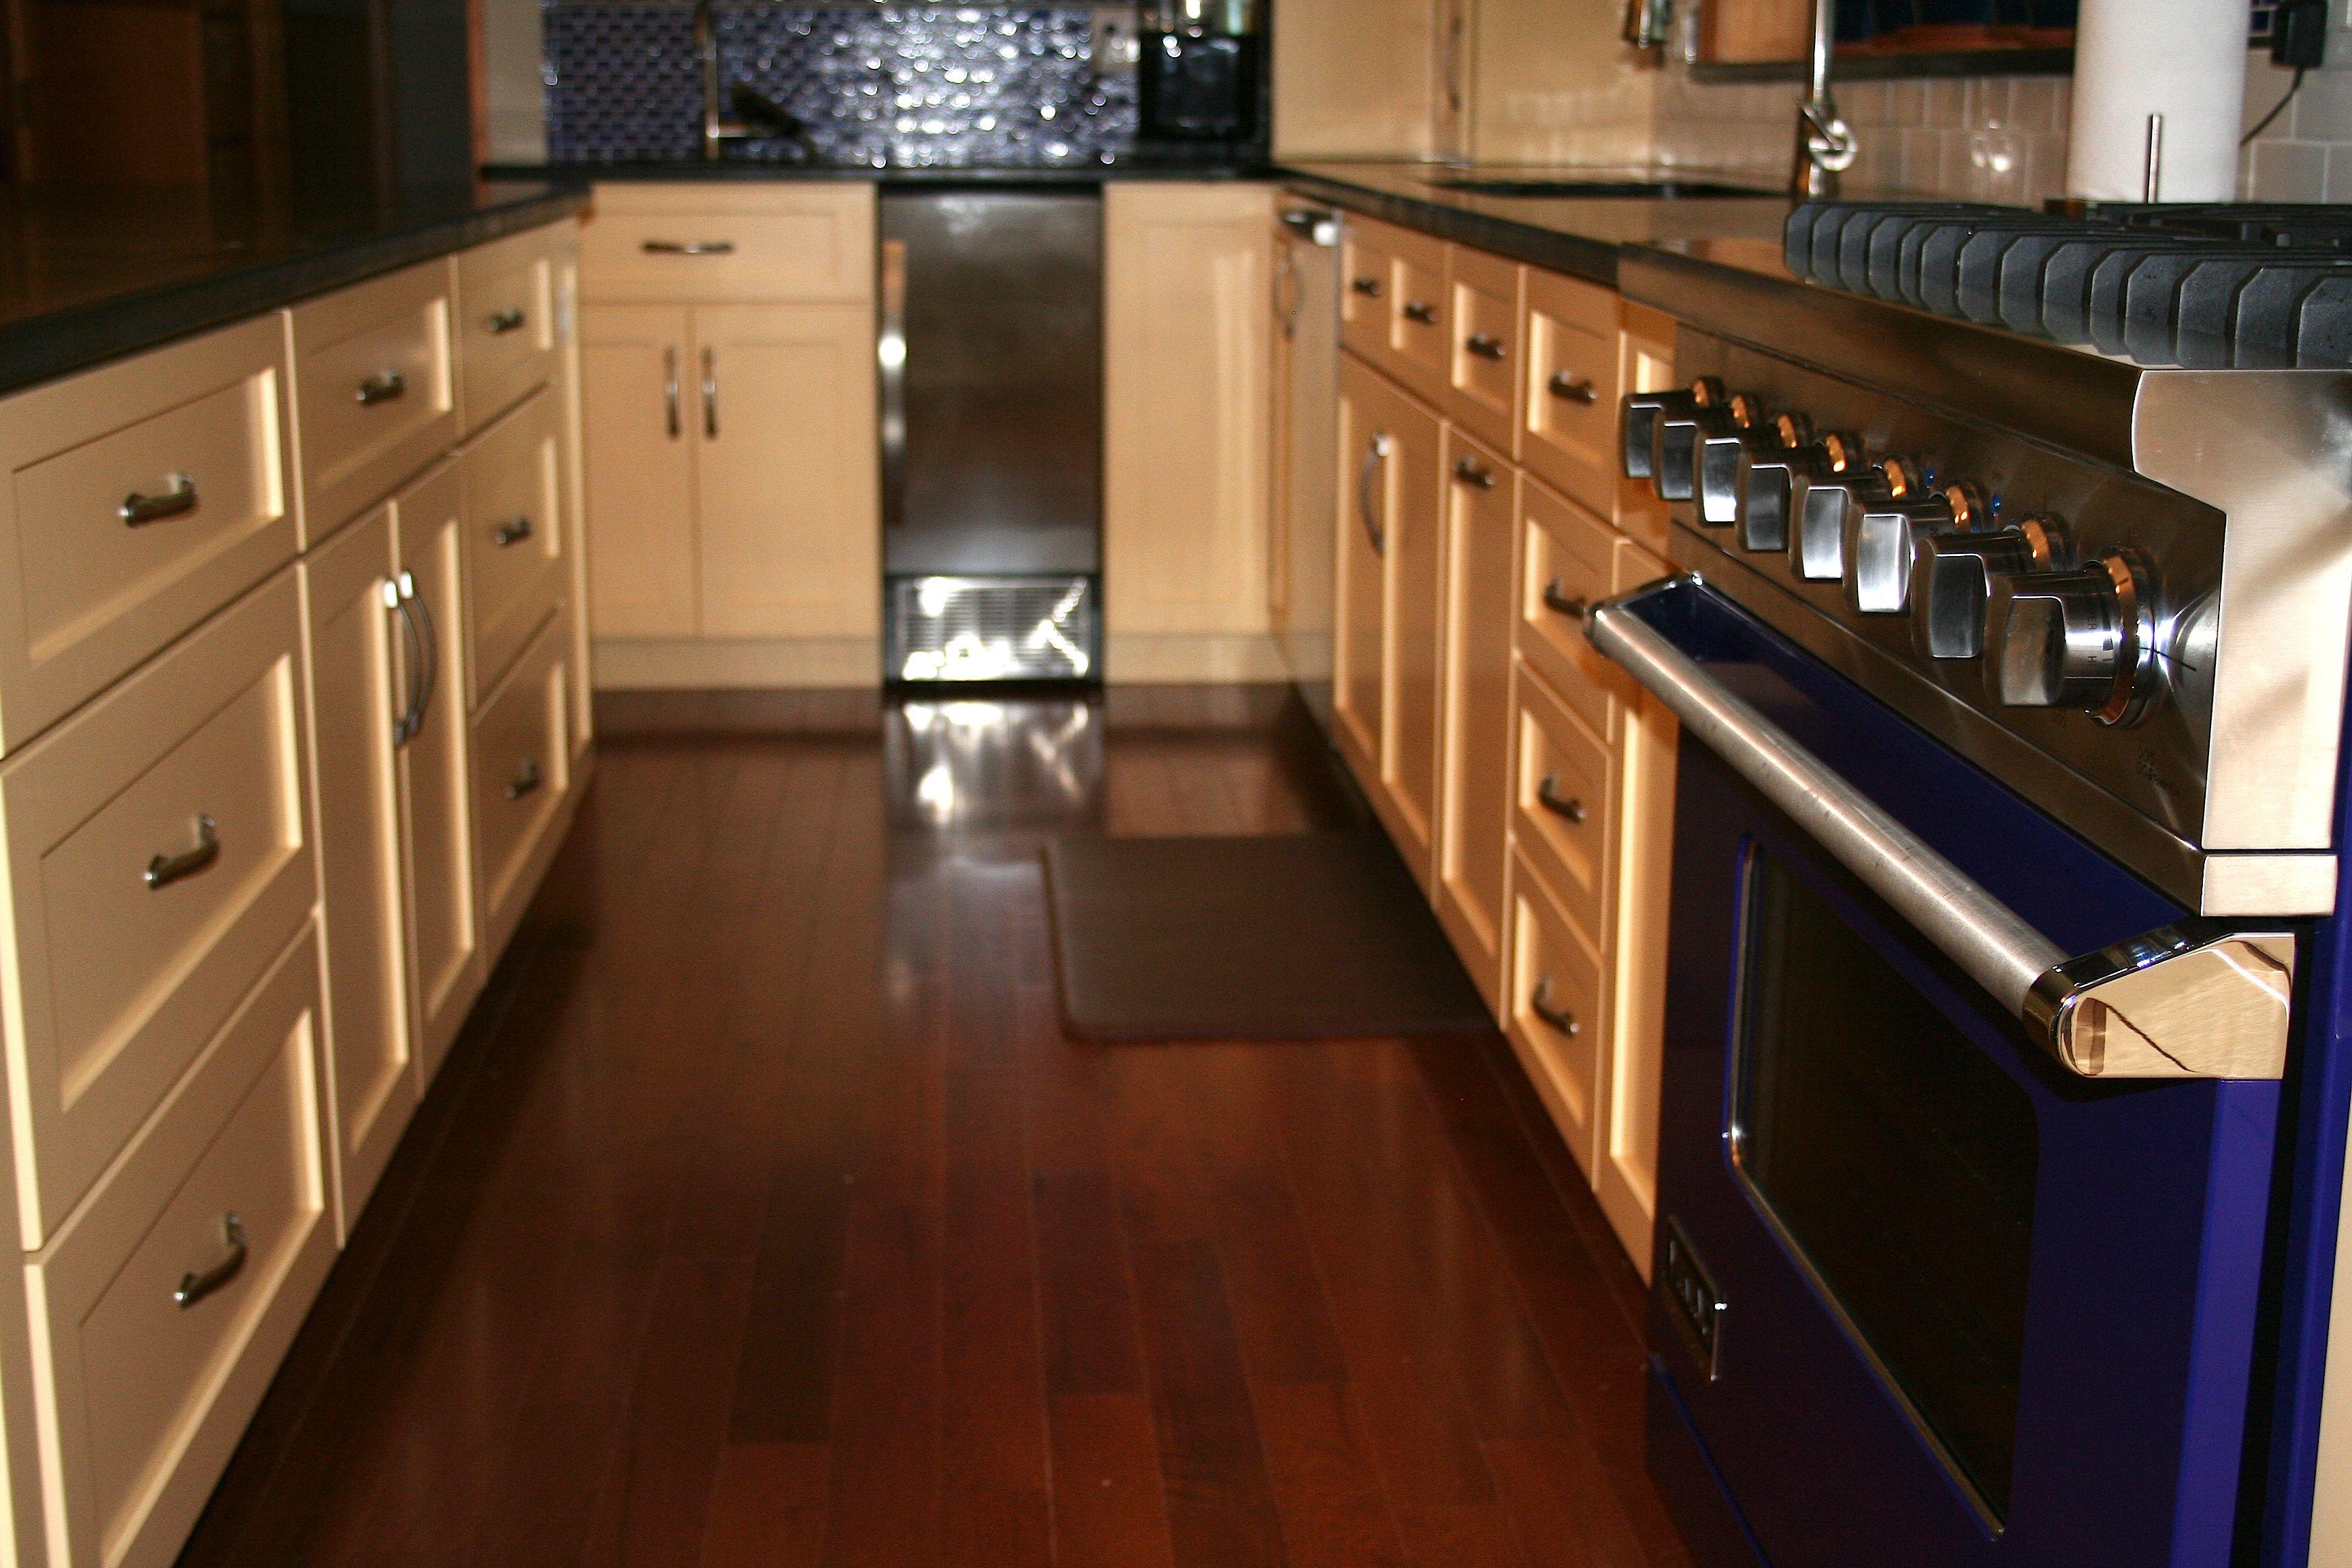 Blue Range And Buttercream Cabinets Create A Harmonious Tone In This Rhodeislandkitchen Kitchen Projects Kitchen S Kitchen